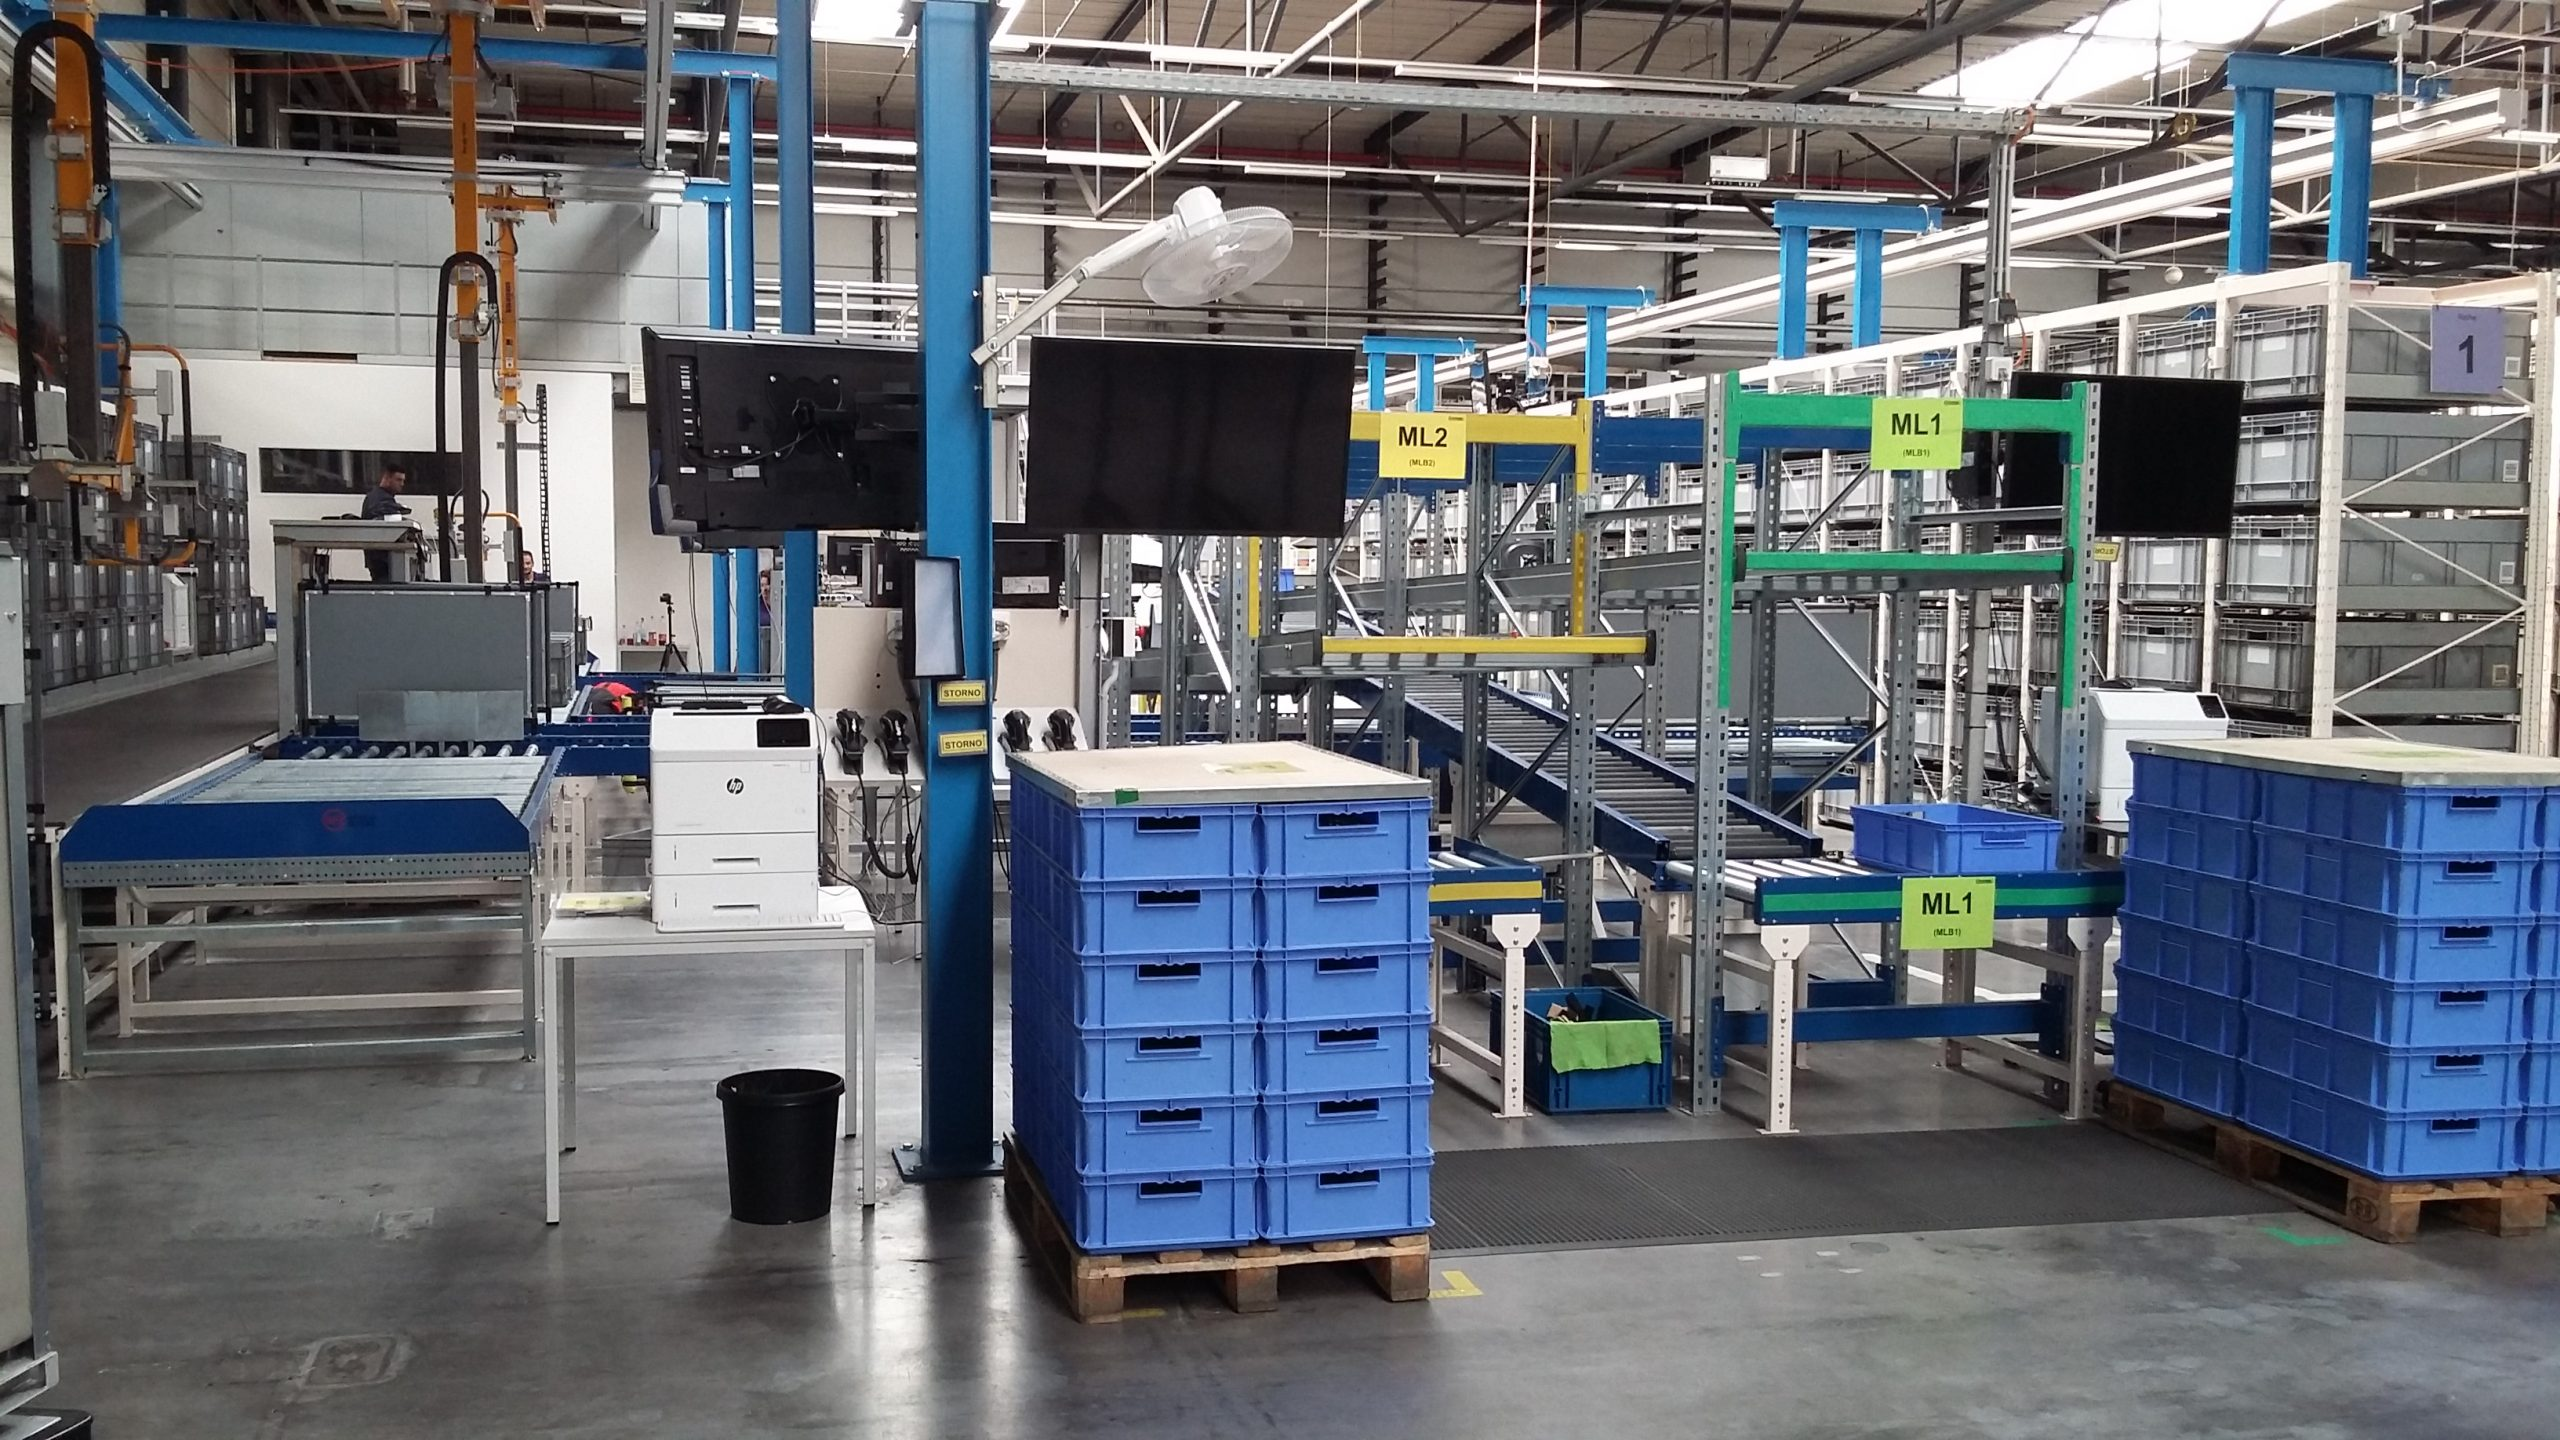 Production warehouse automation for Kromberg&Schubert - 11 - kapelou.com